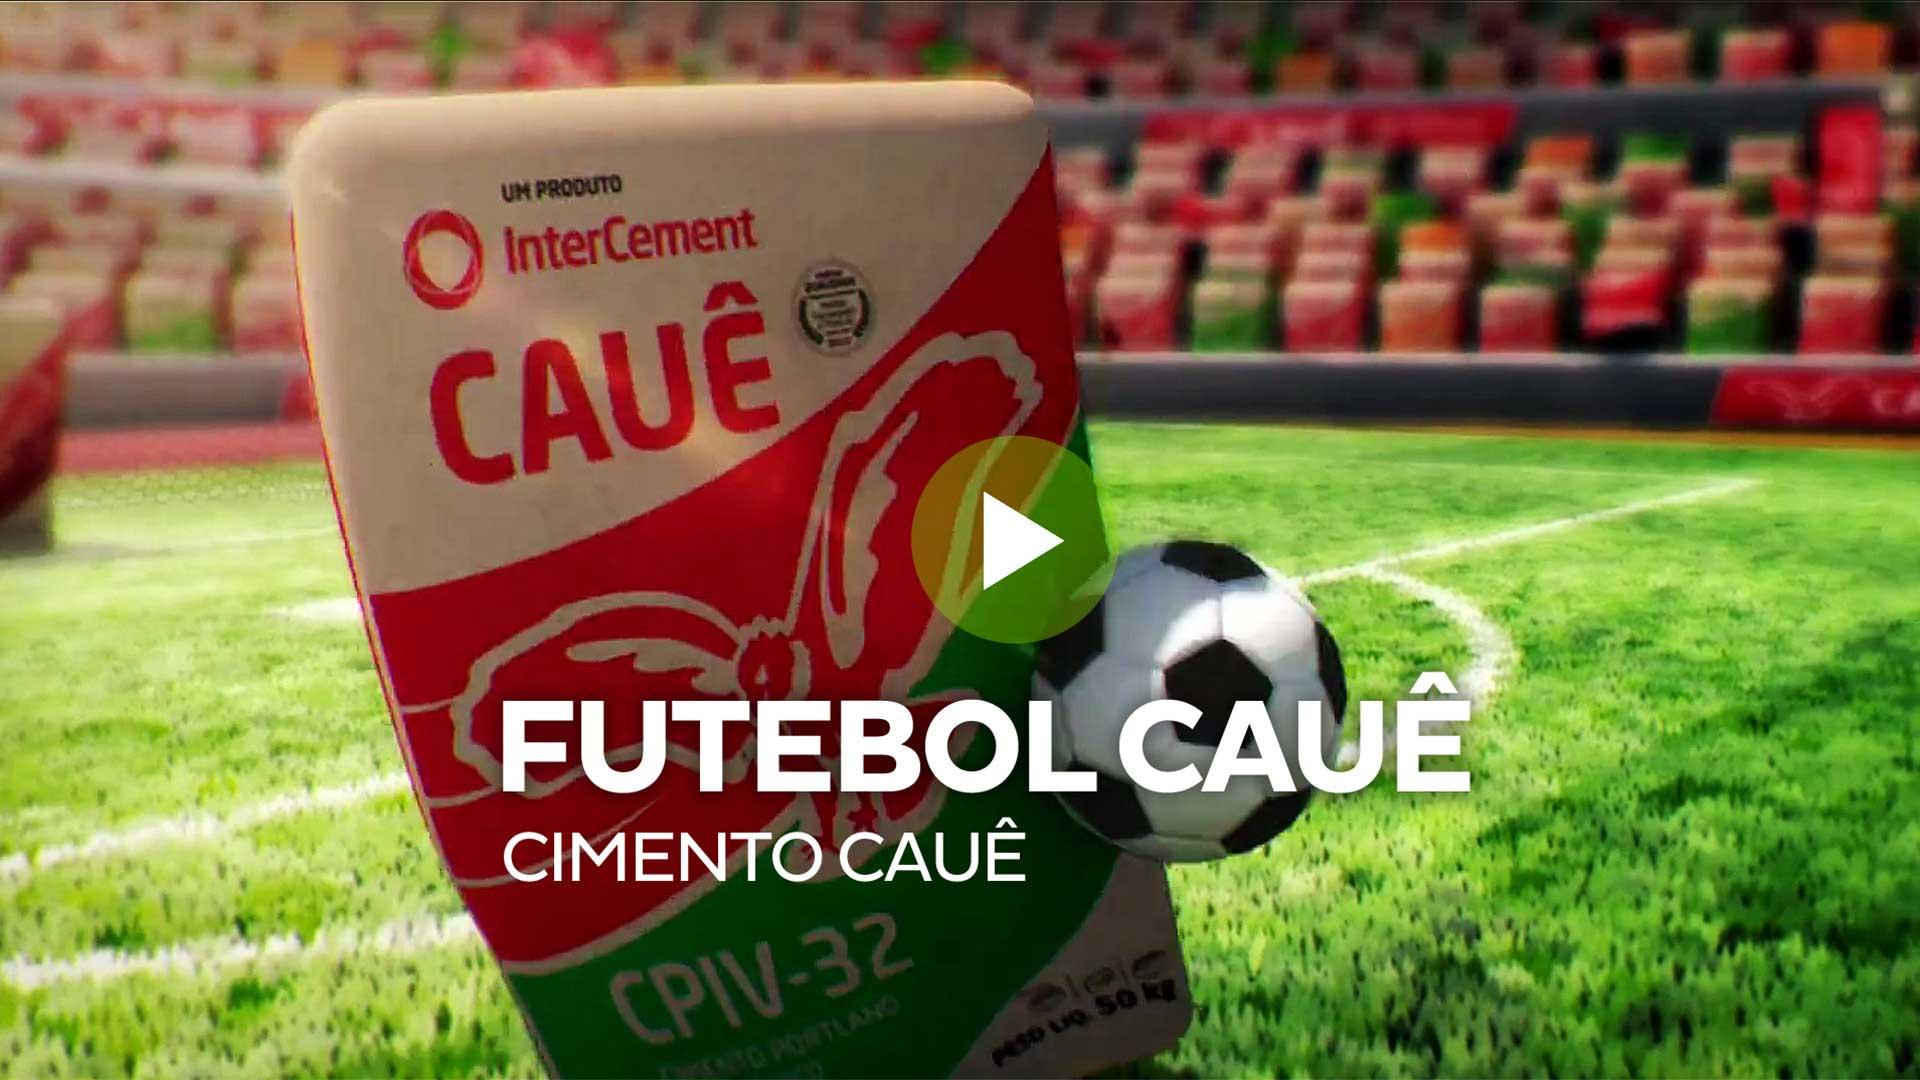 Case Intercement: Futebol